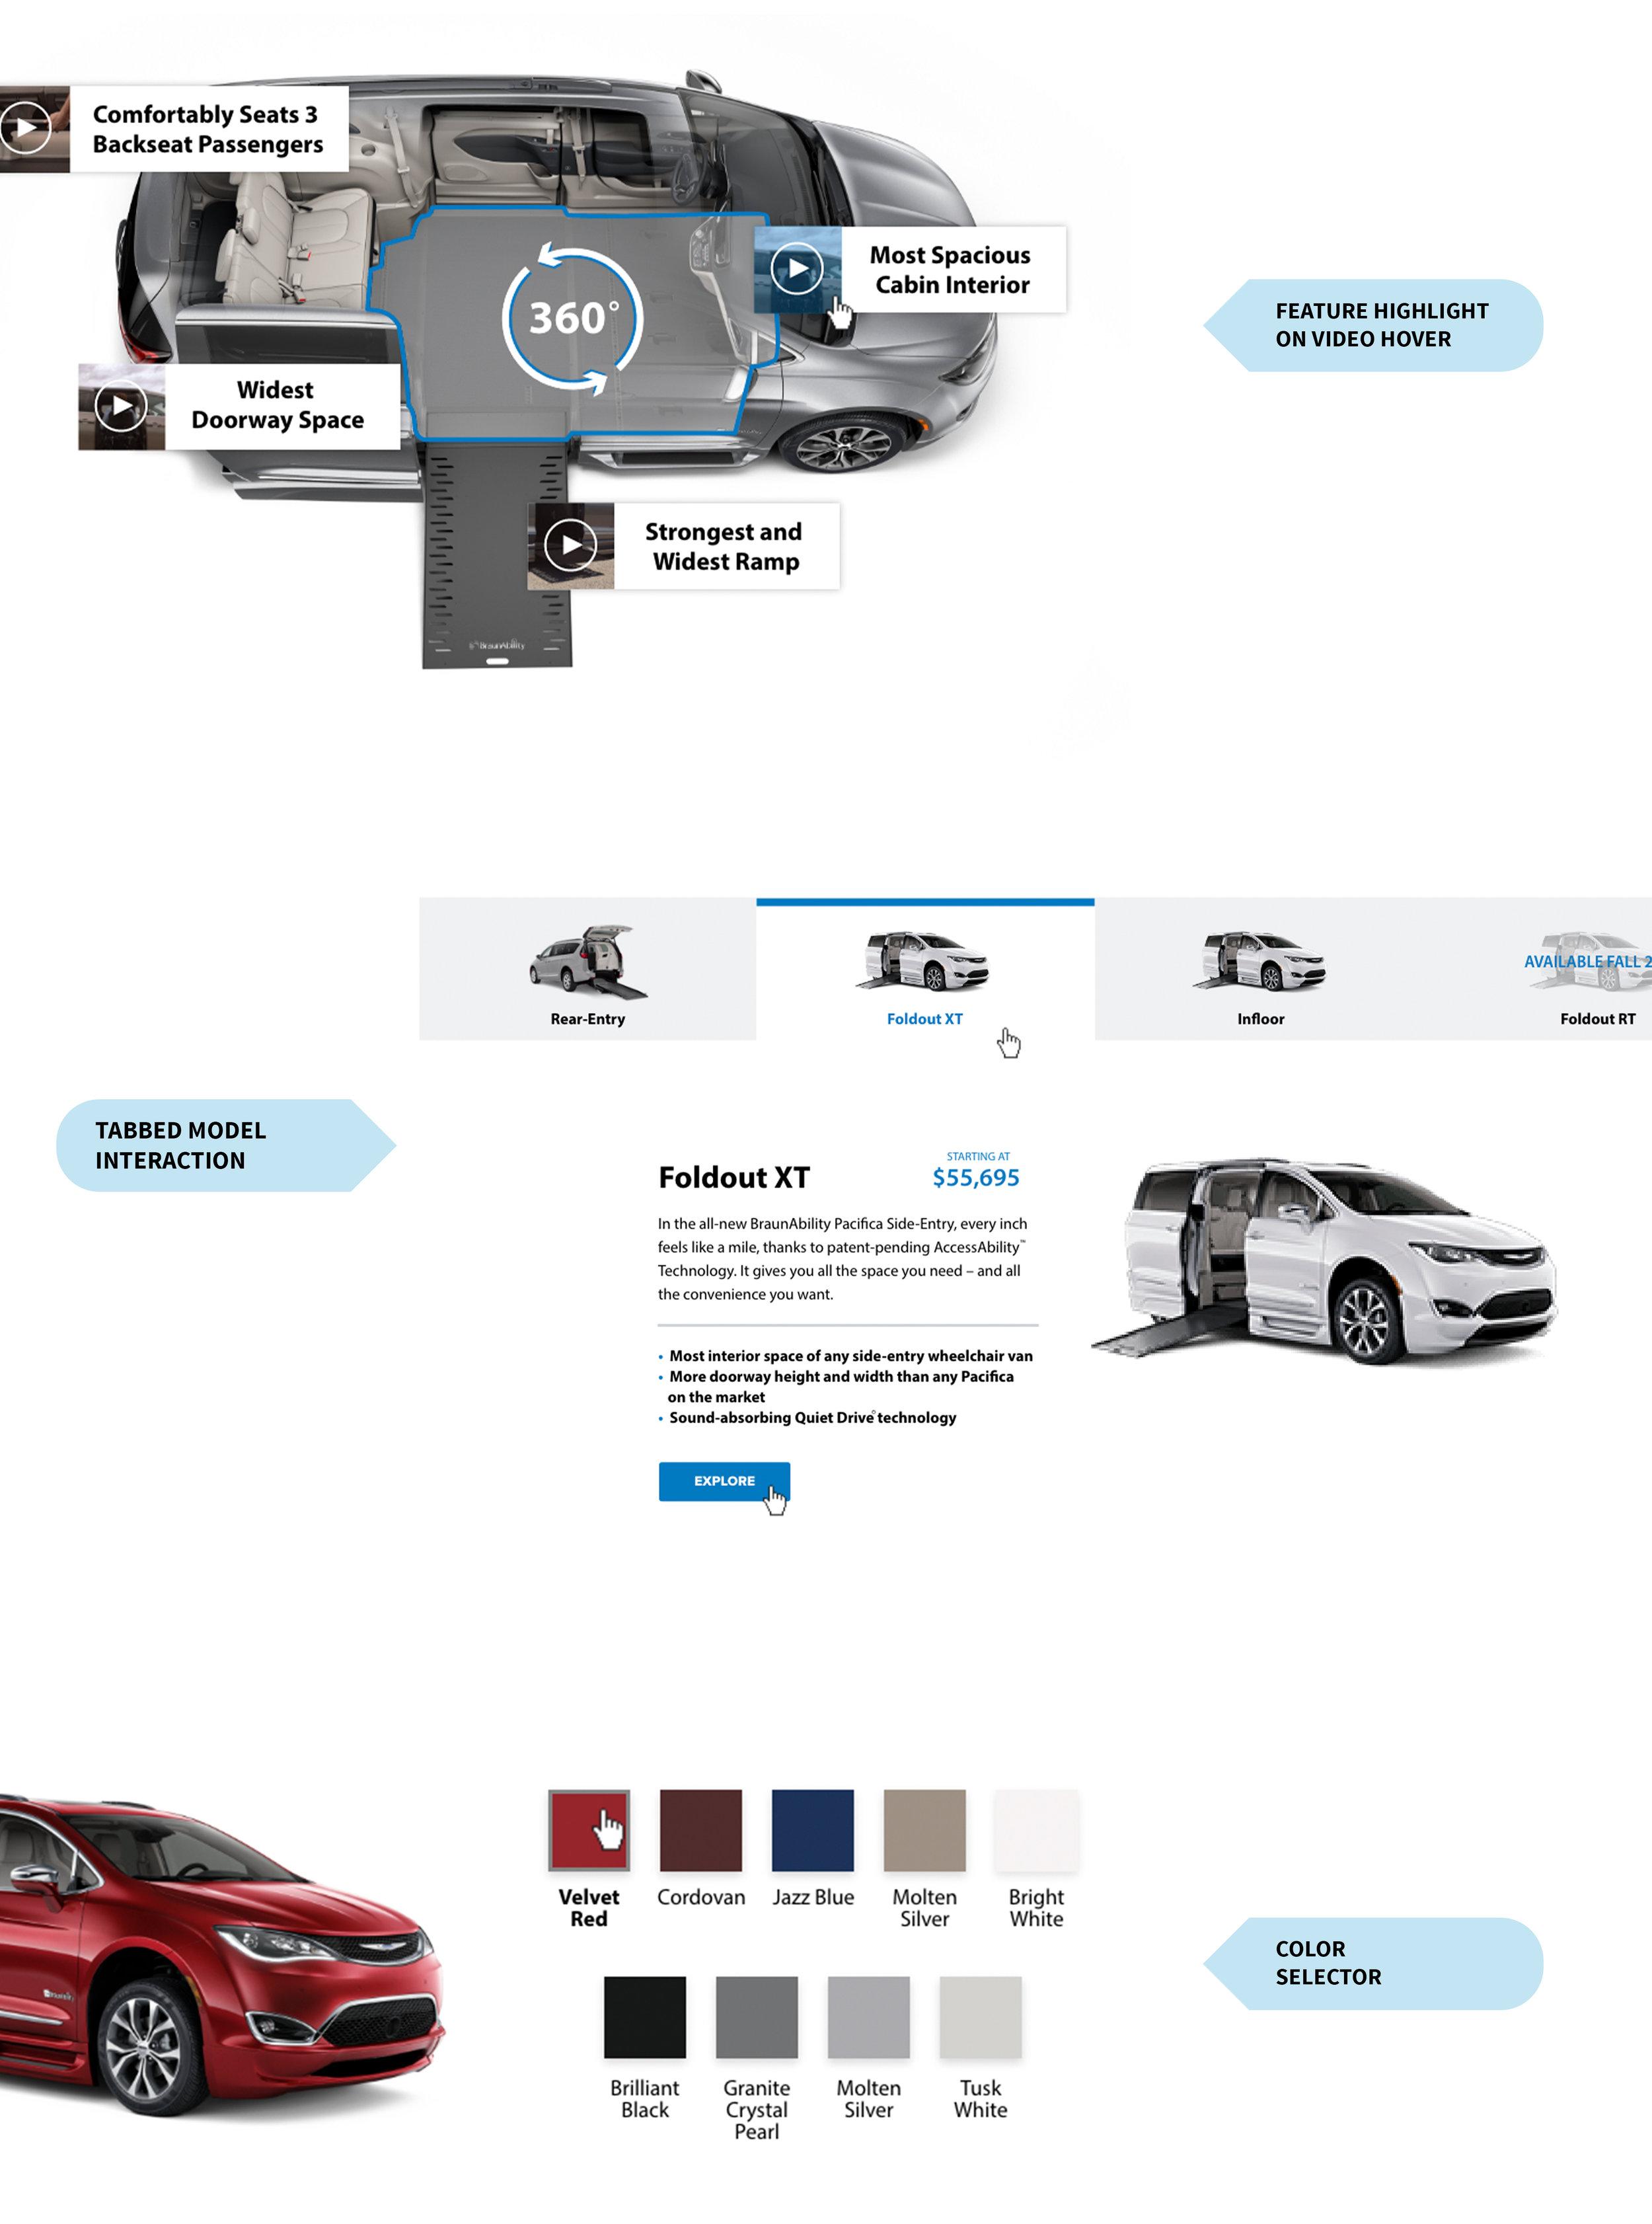 braunability-landing-page-interactions.jpg